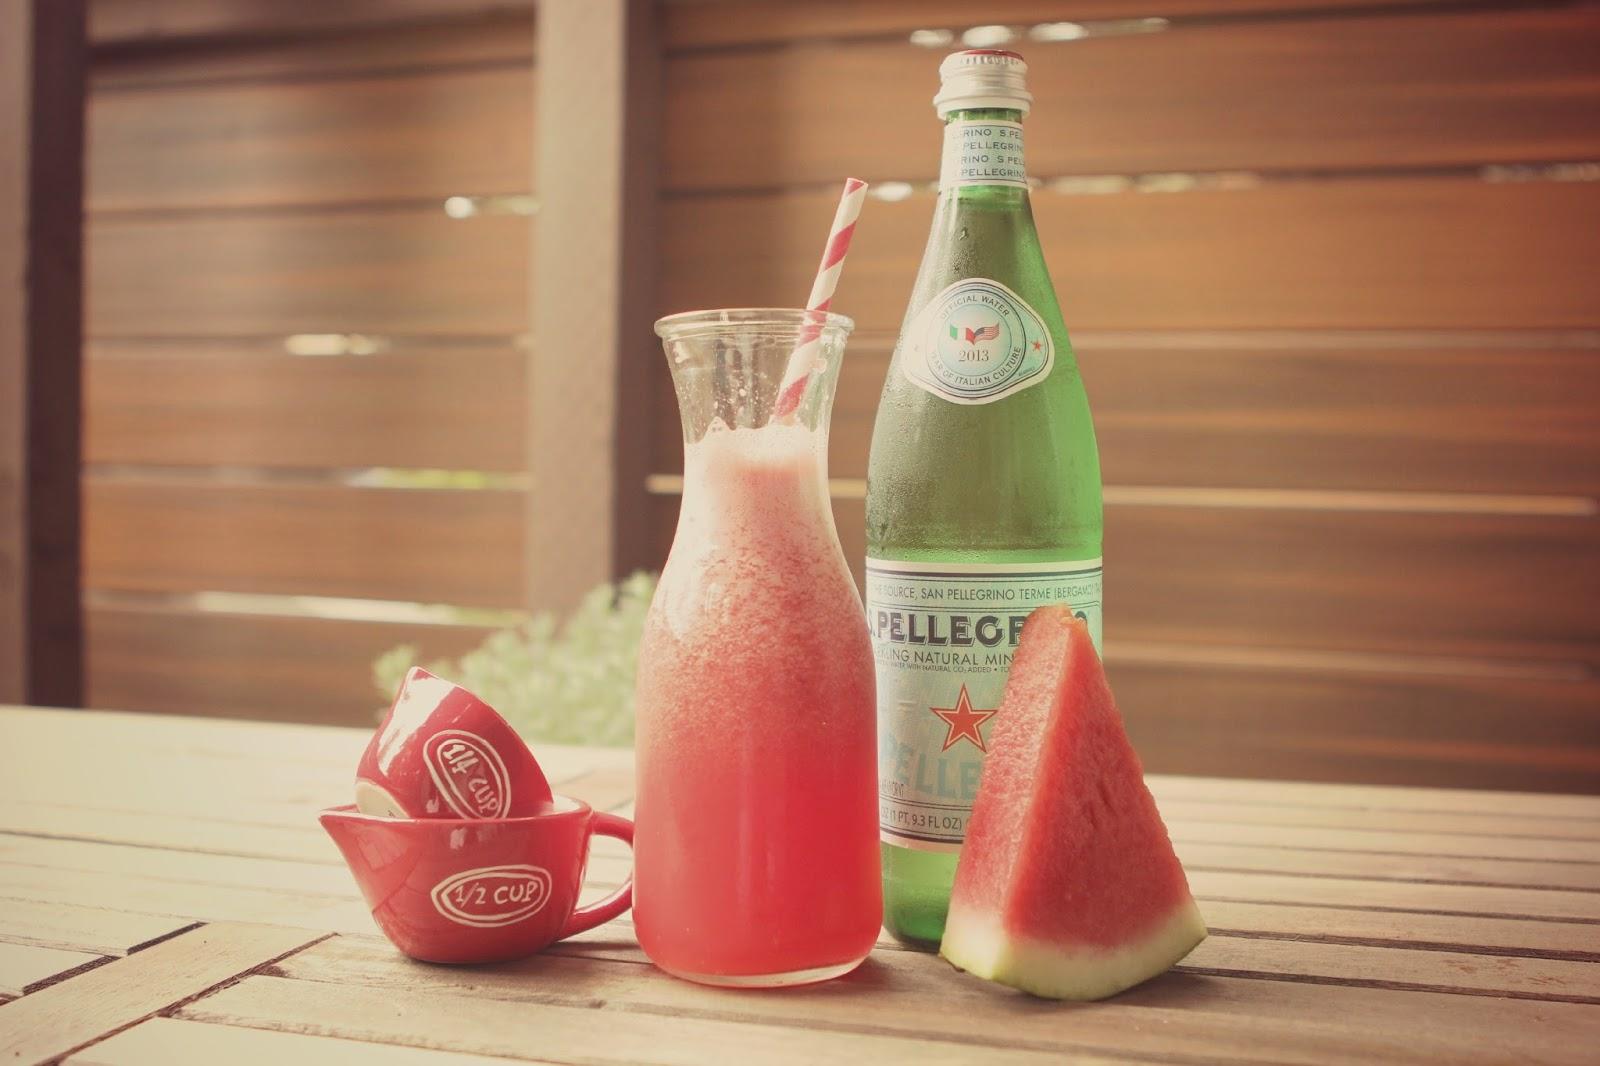 Rustic Peach: Sparkling Watermelonade